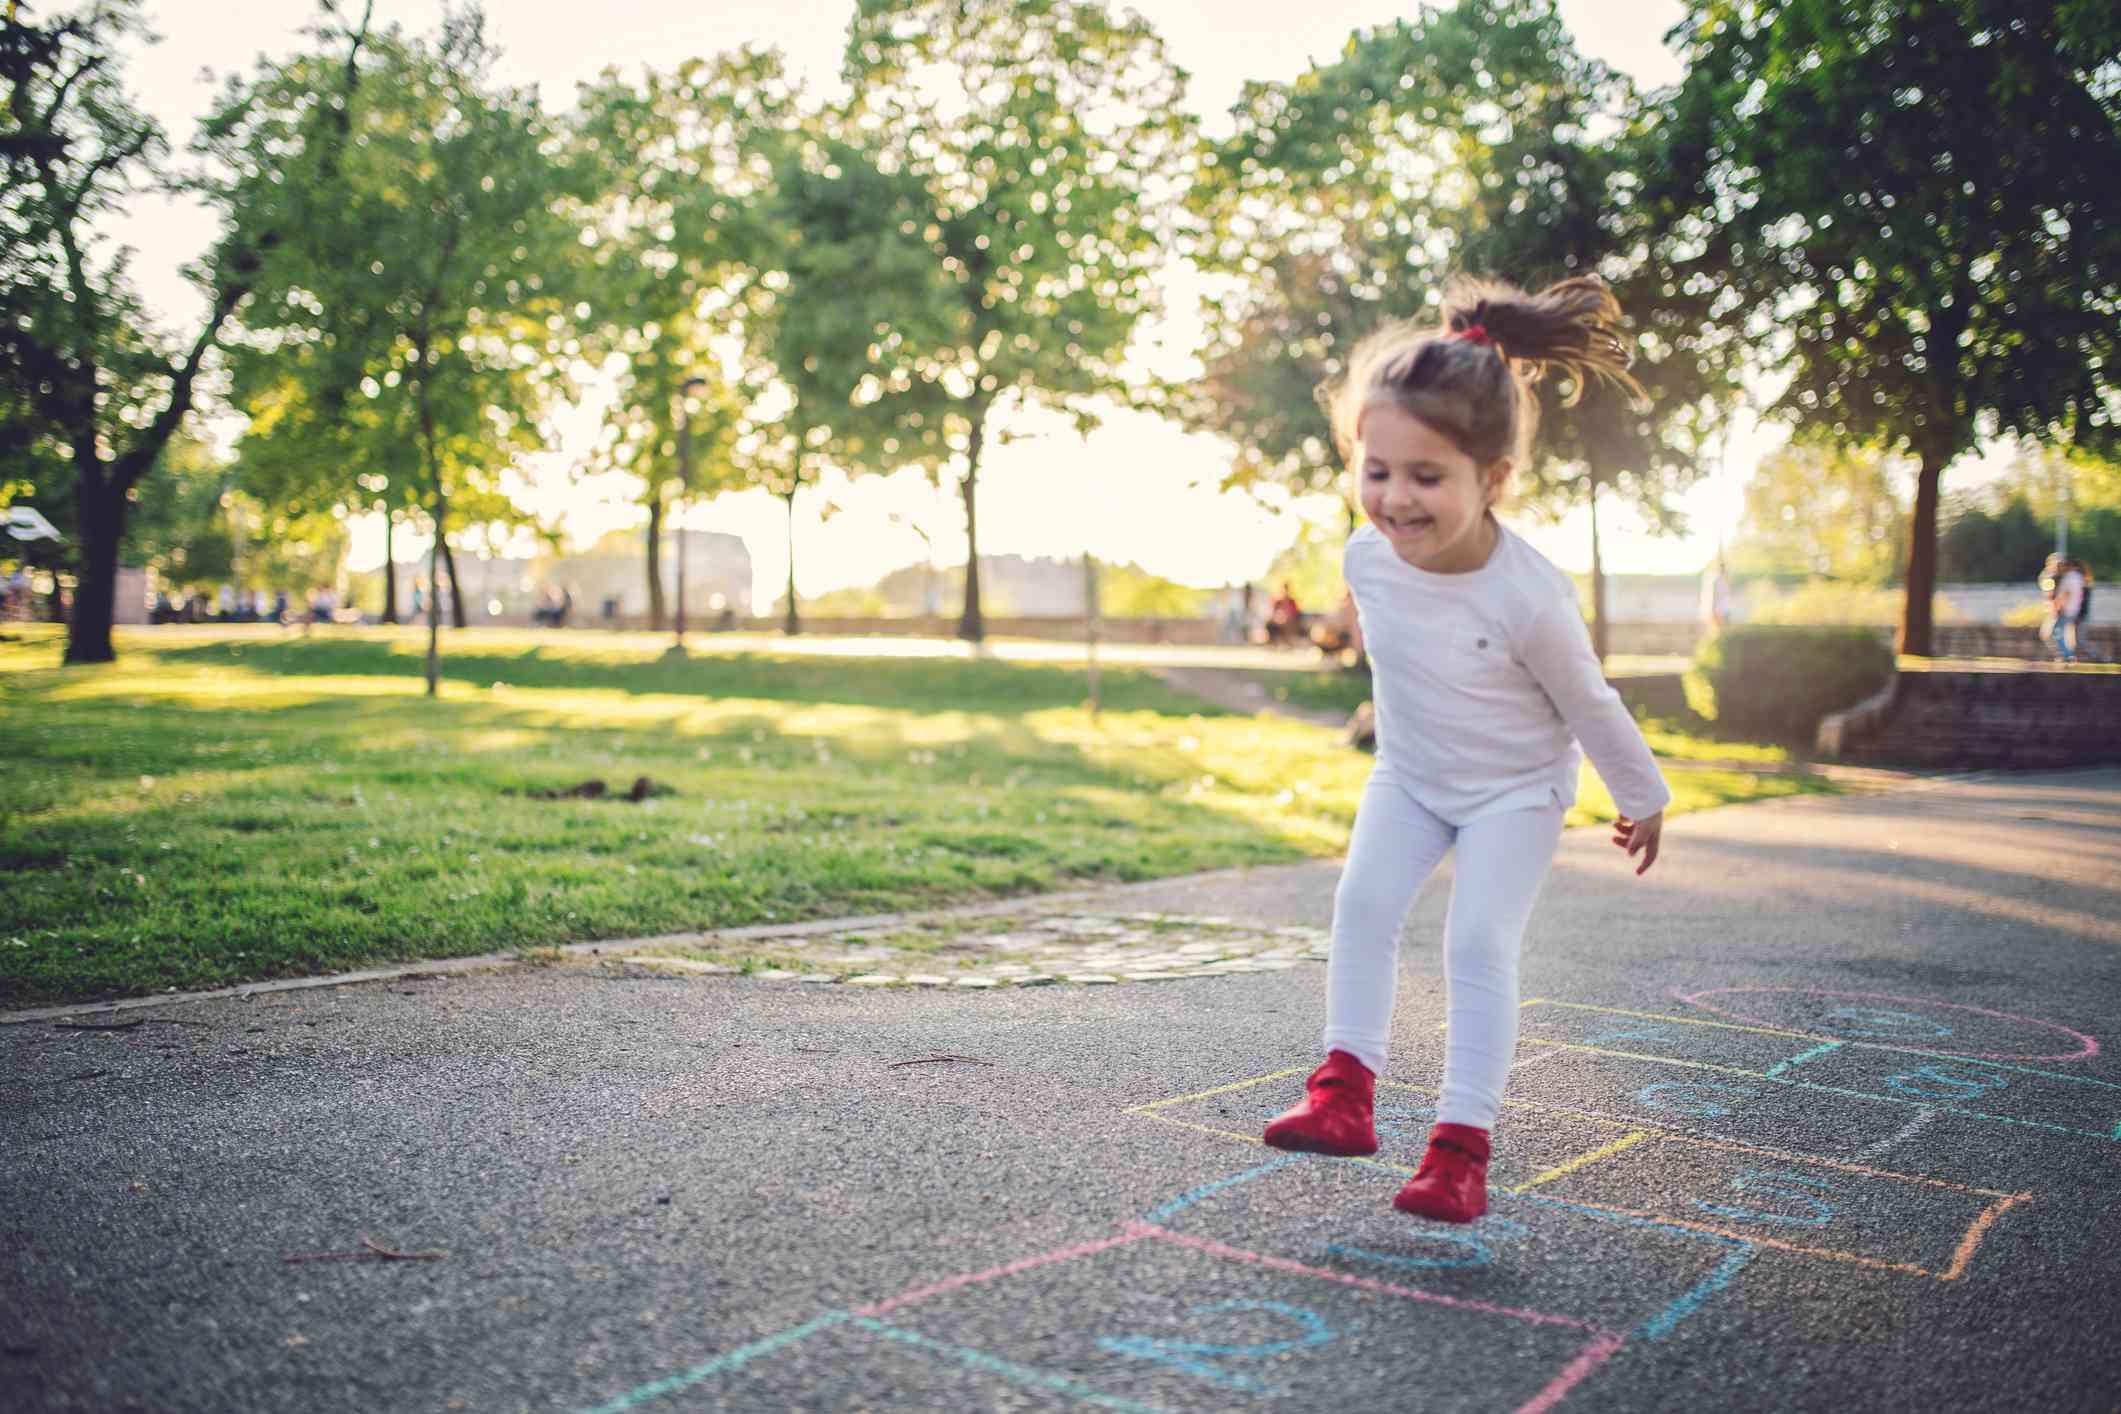 Happy child on a playground